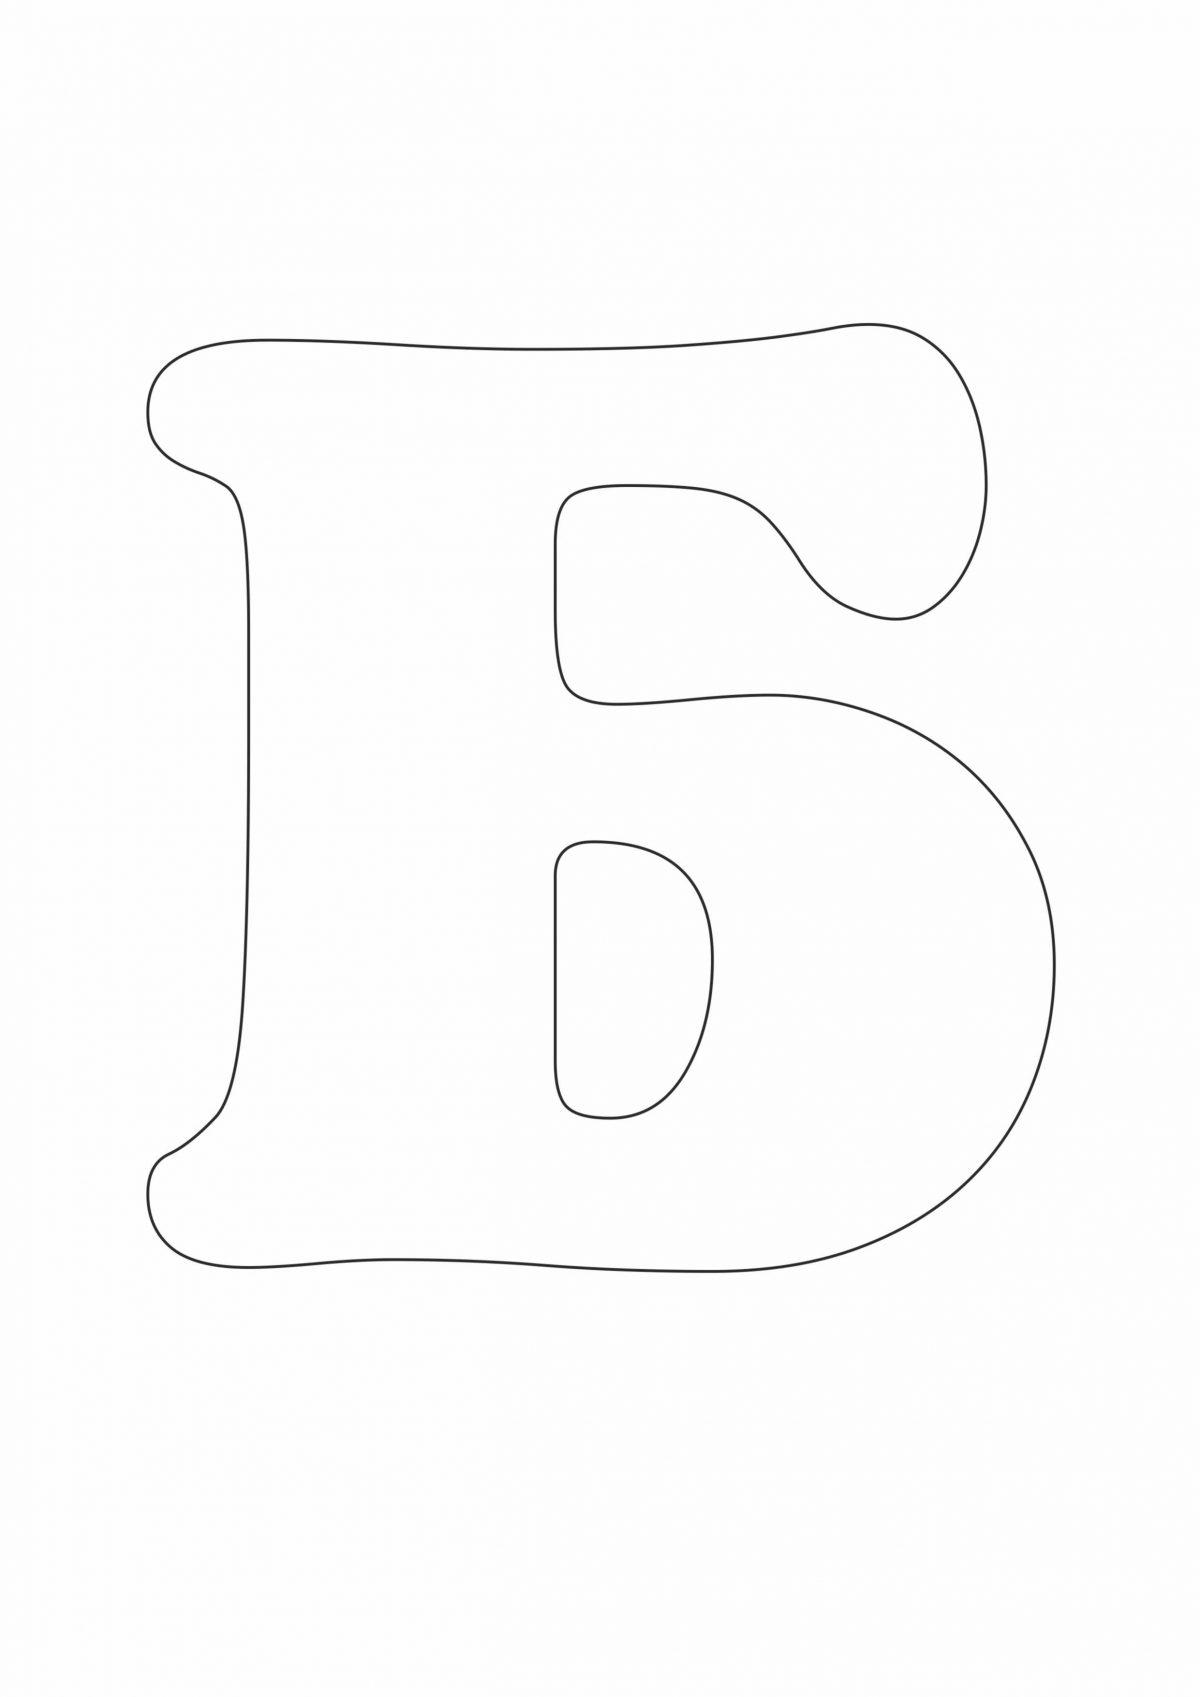 Трафарет буквы Б